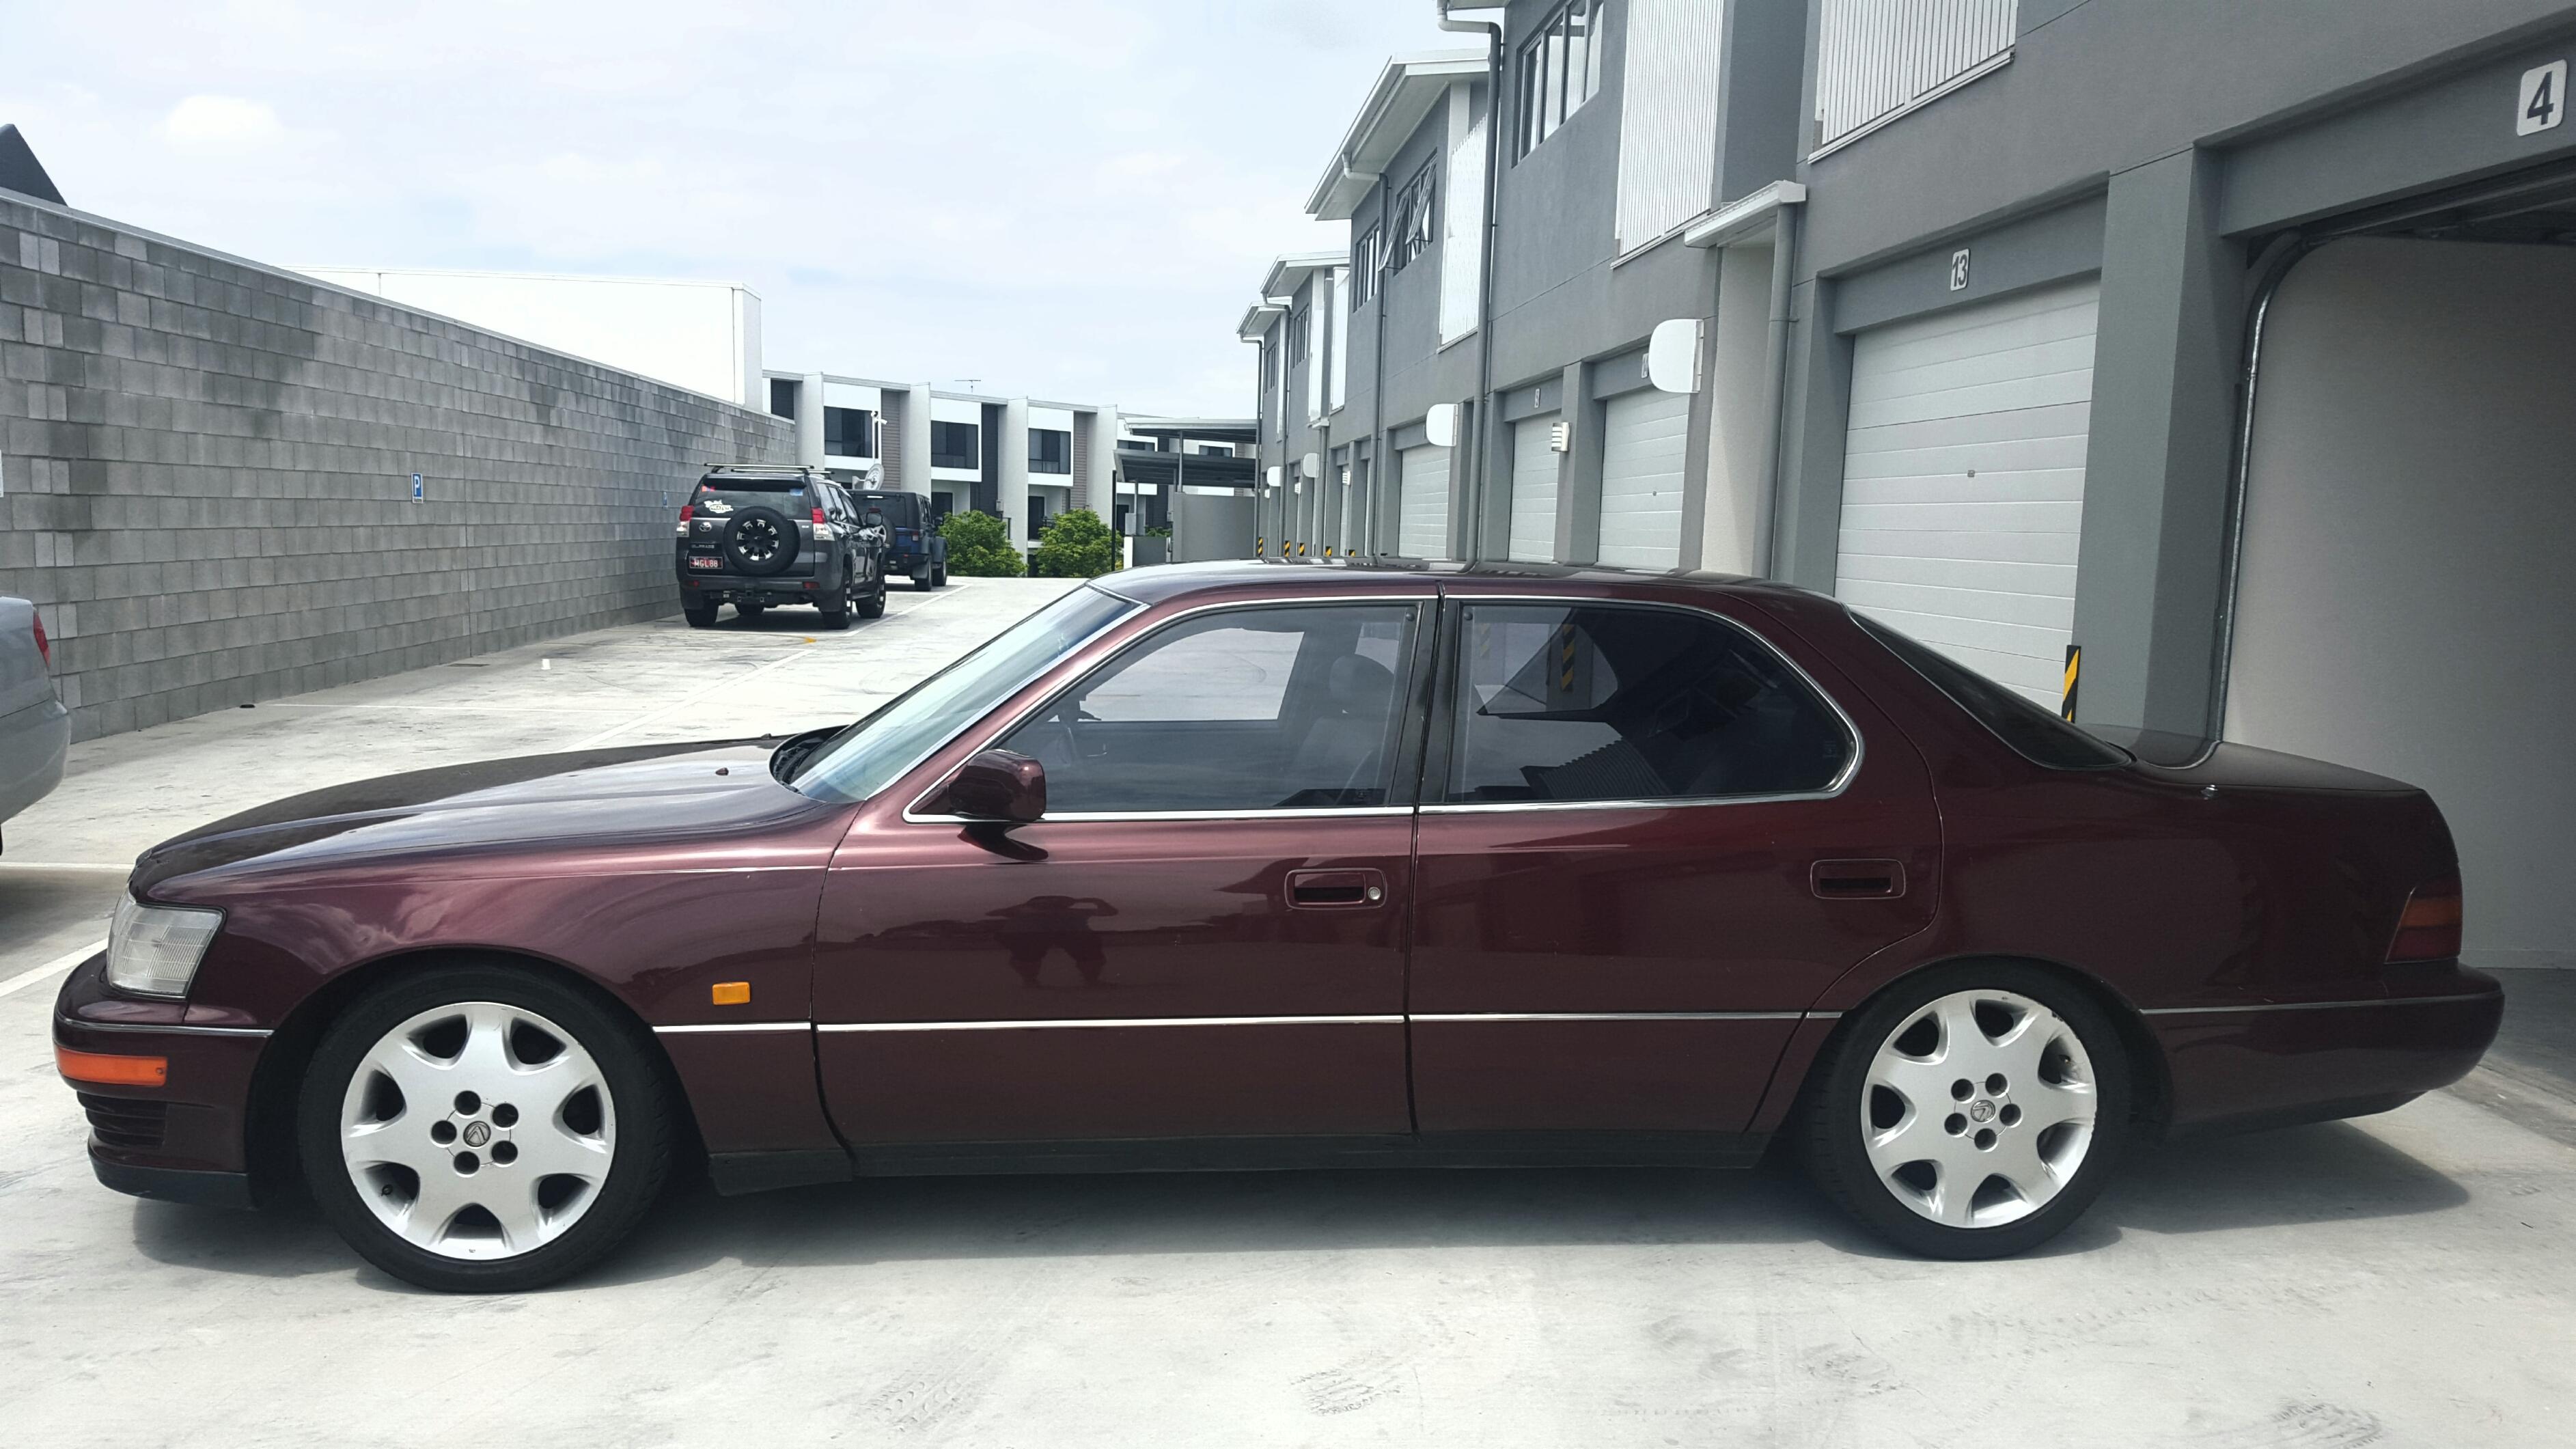 ls higdon miles s auto dealer tony sales al lexus cars used